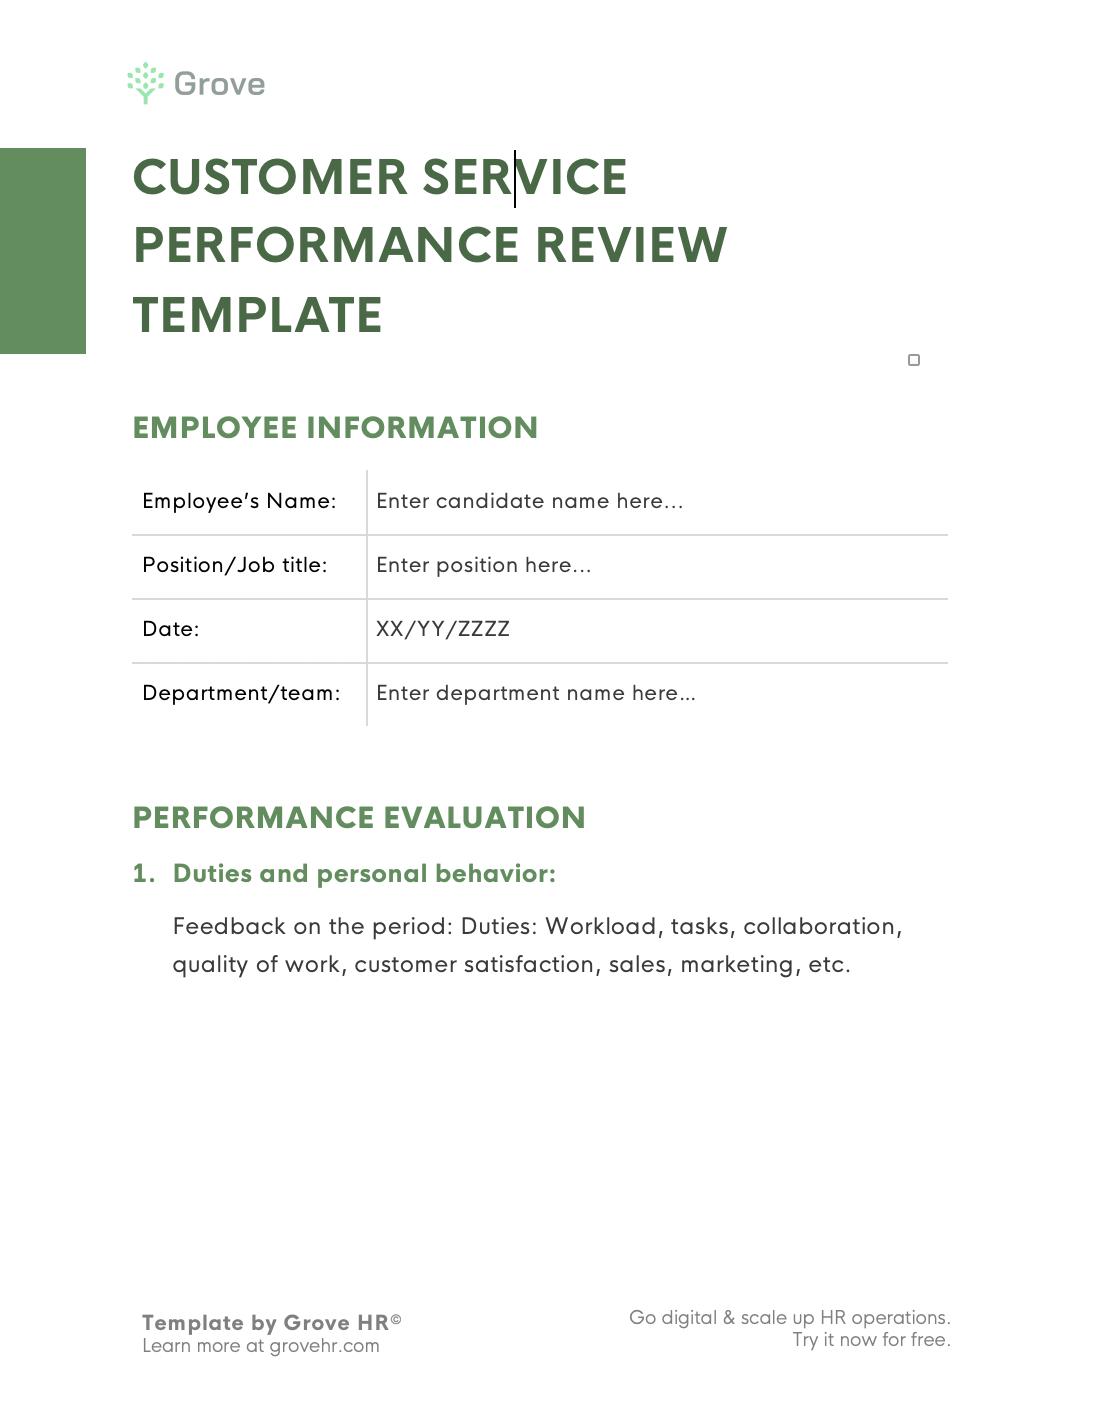 Grove HR - Customer service performance review template slider 2